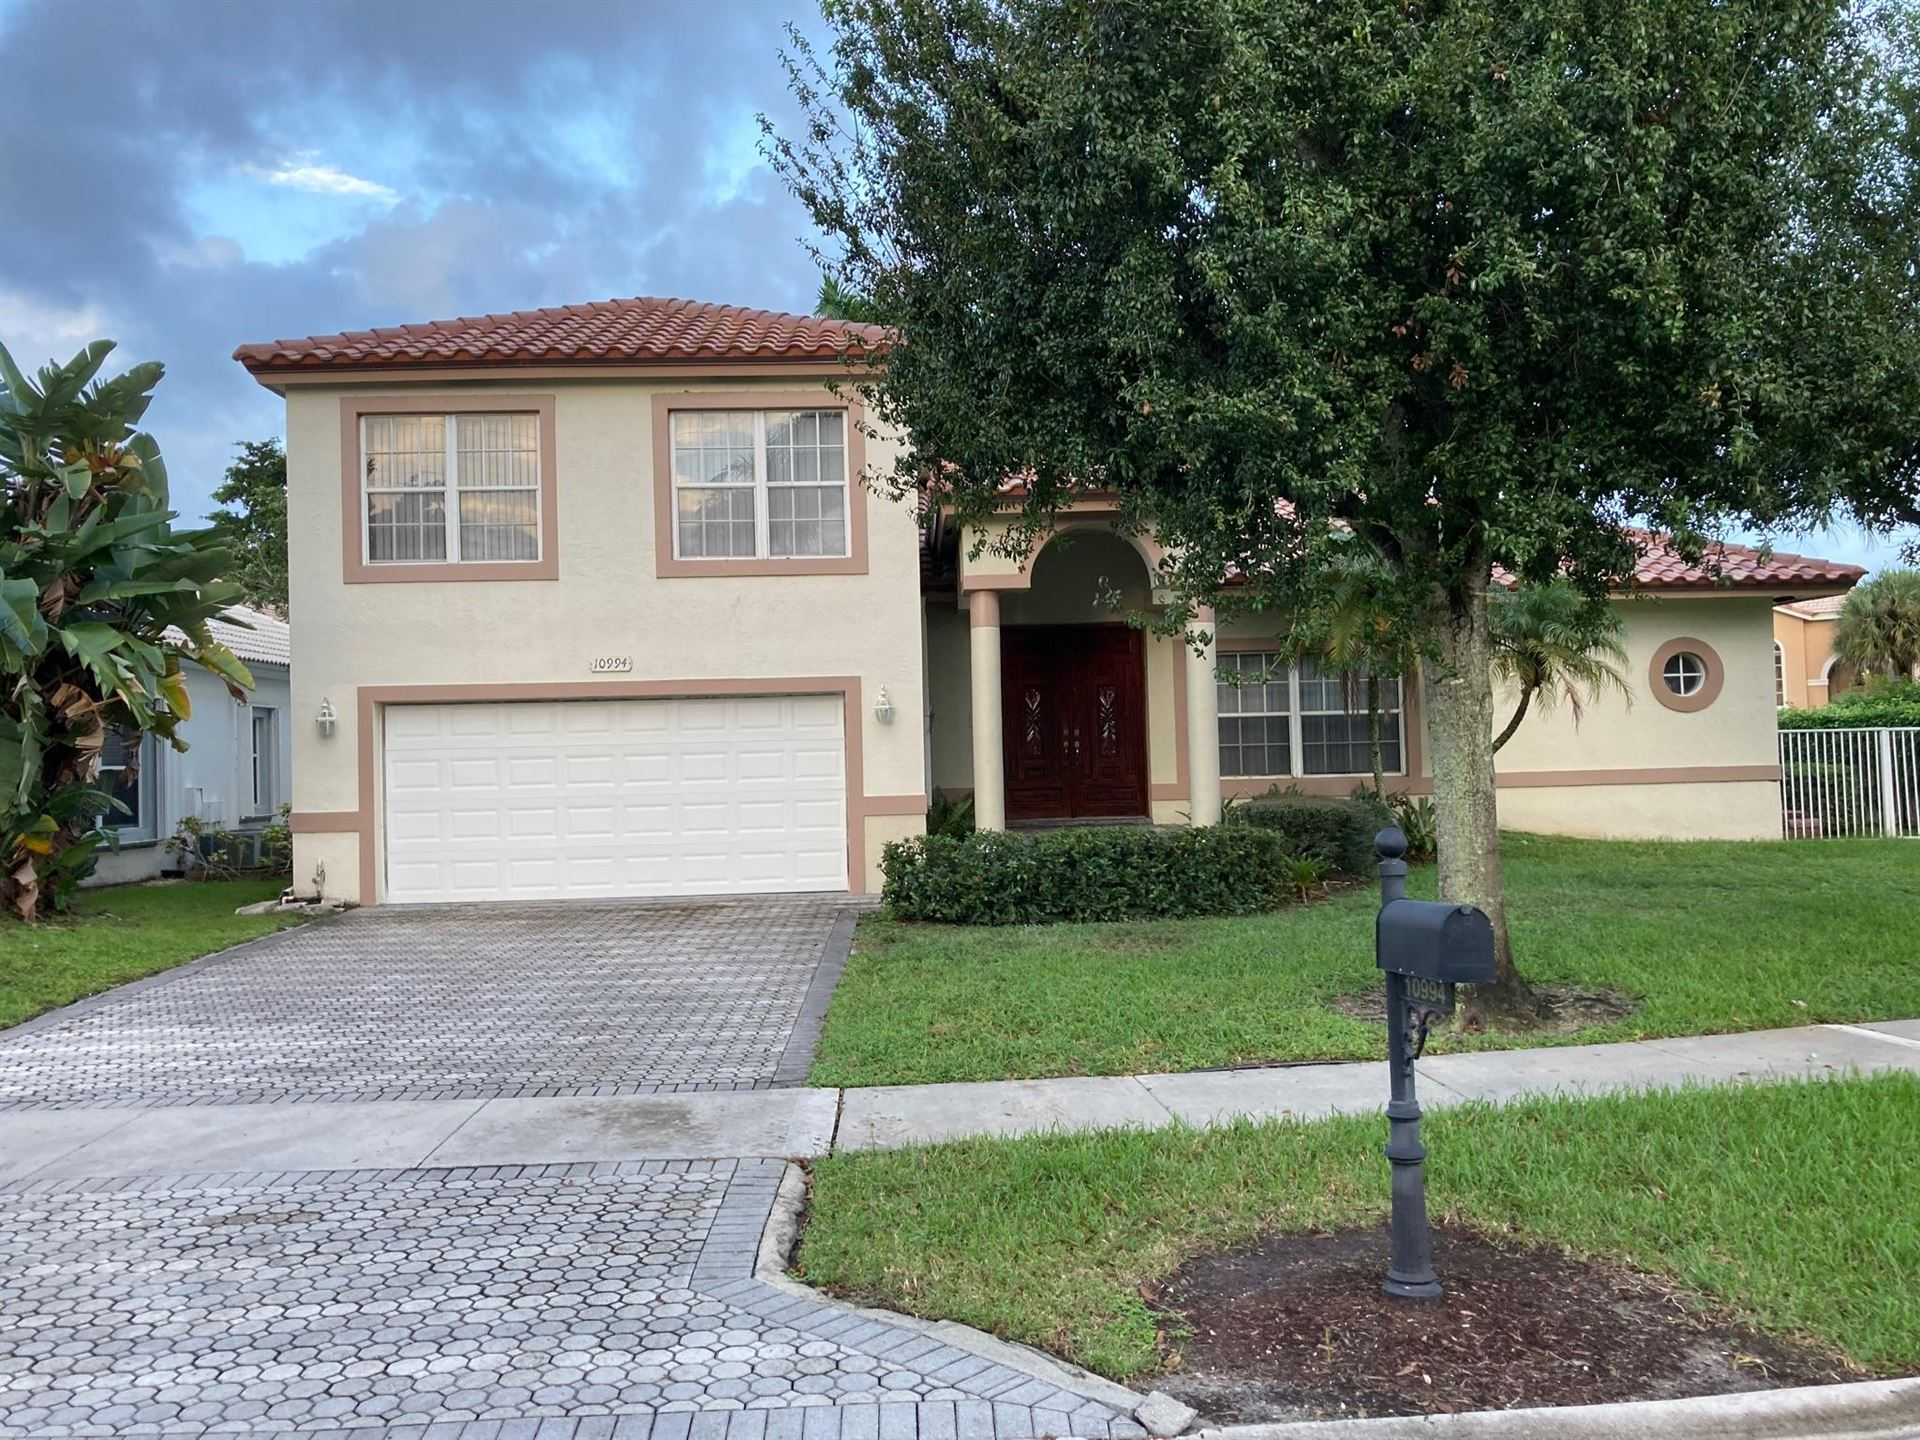 10994 Ravel Court, Boca Raton, FL 33498 - #: RX-10667769